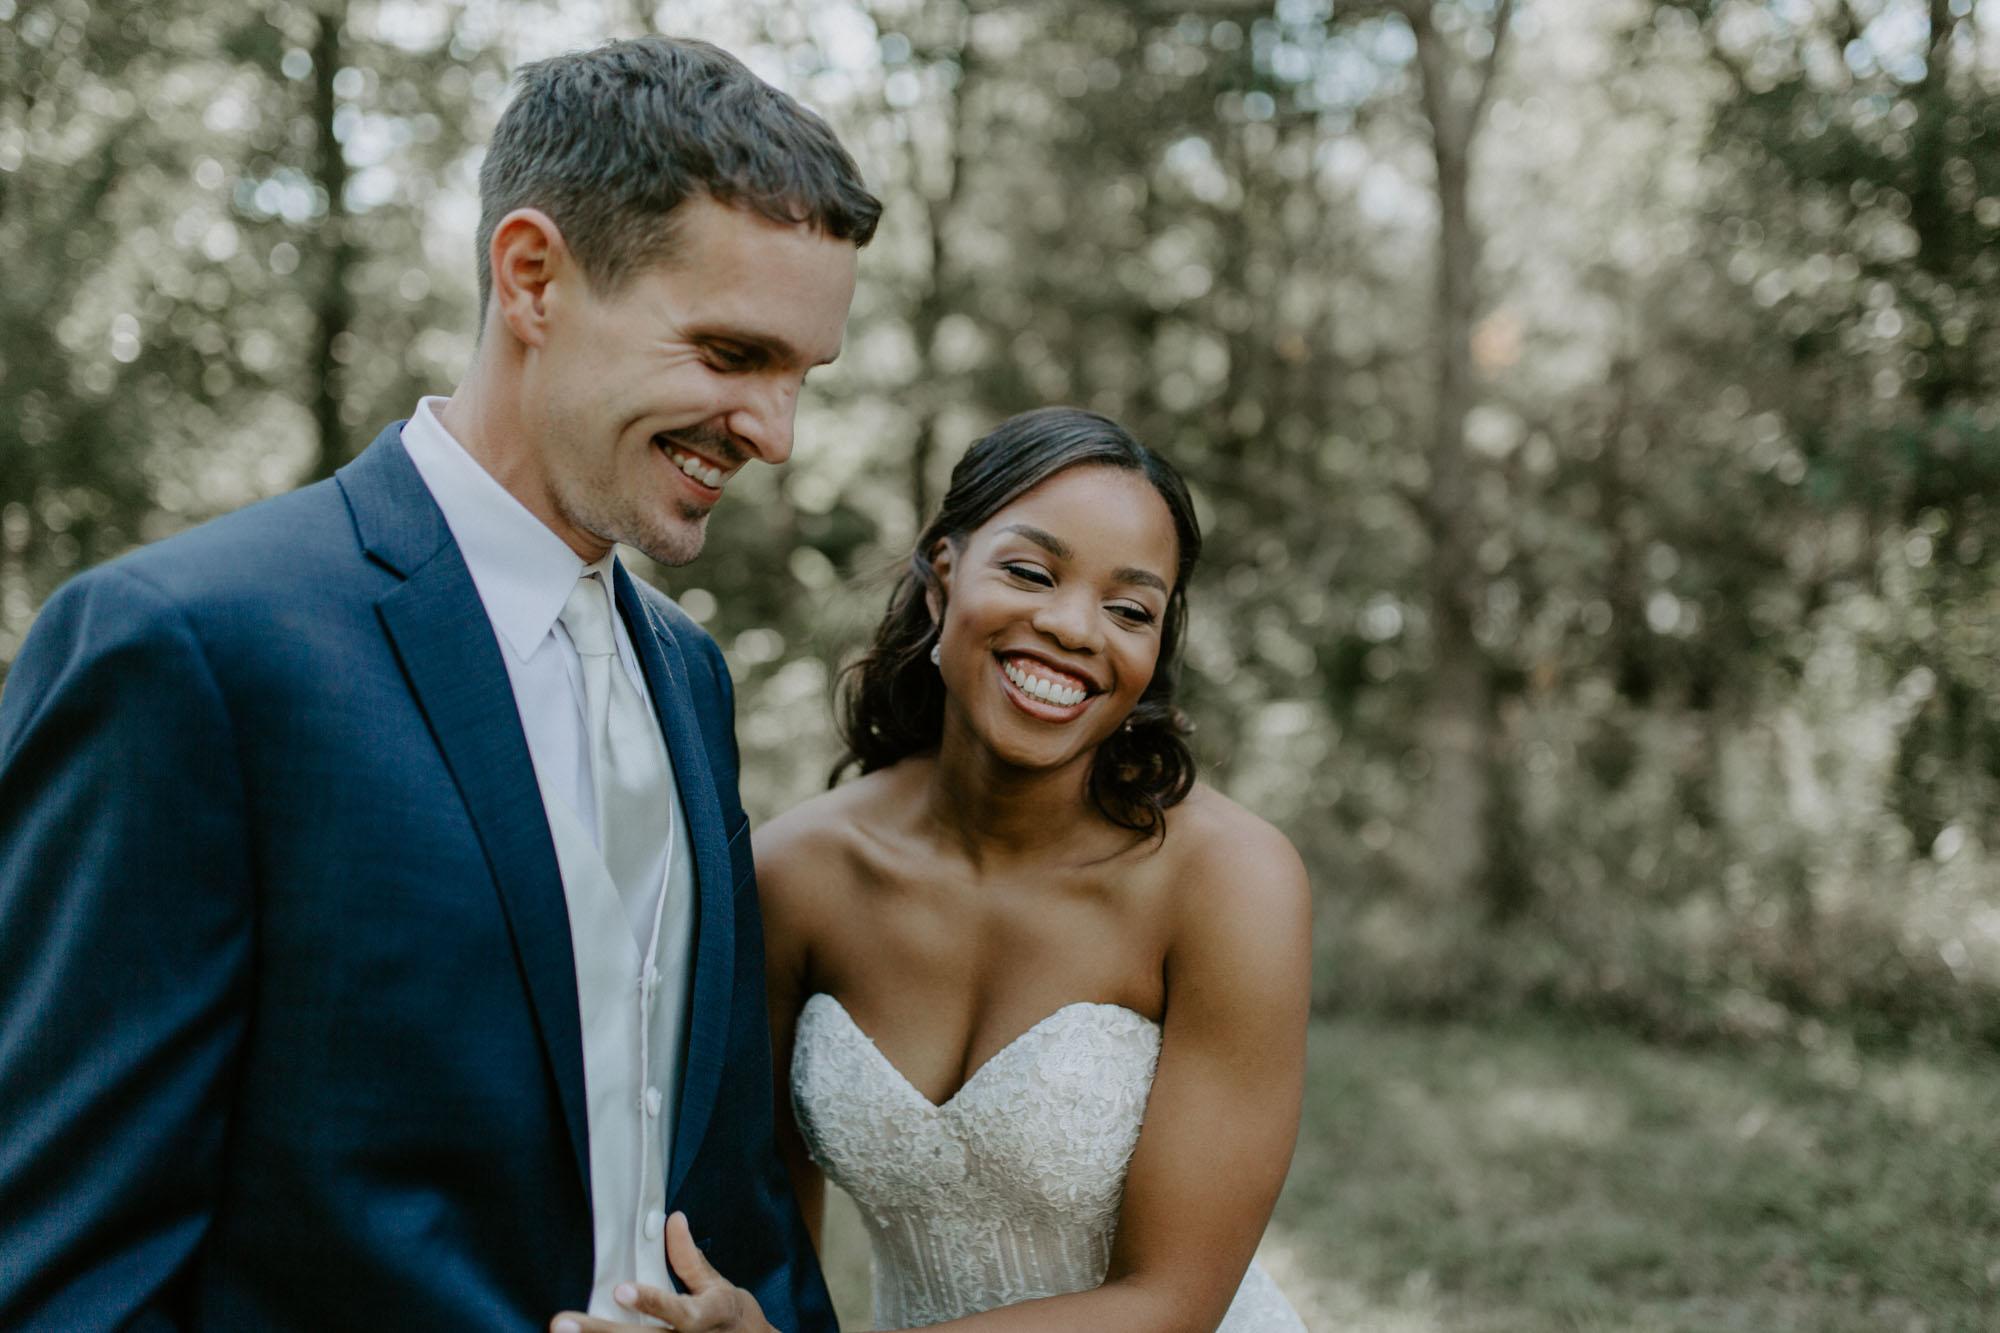 prairie_glass_house_wedding_champaign_wright_photographs_simon_0068.jpg